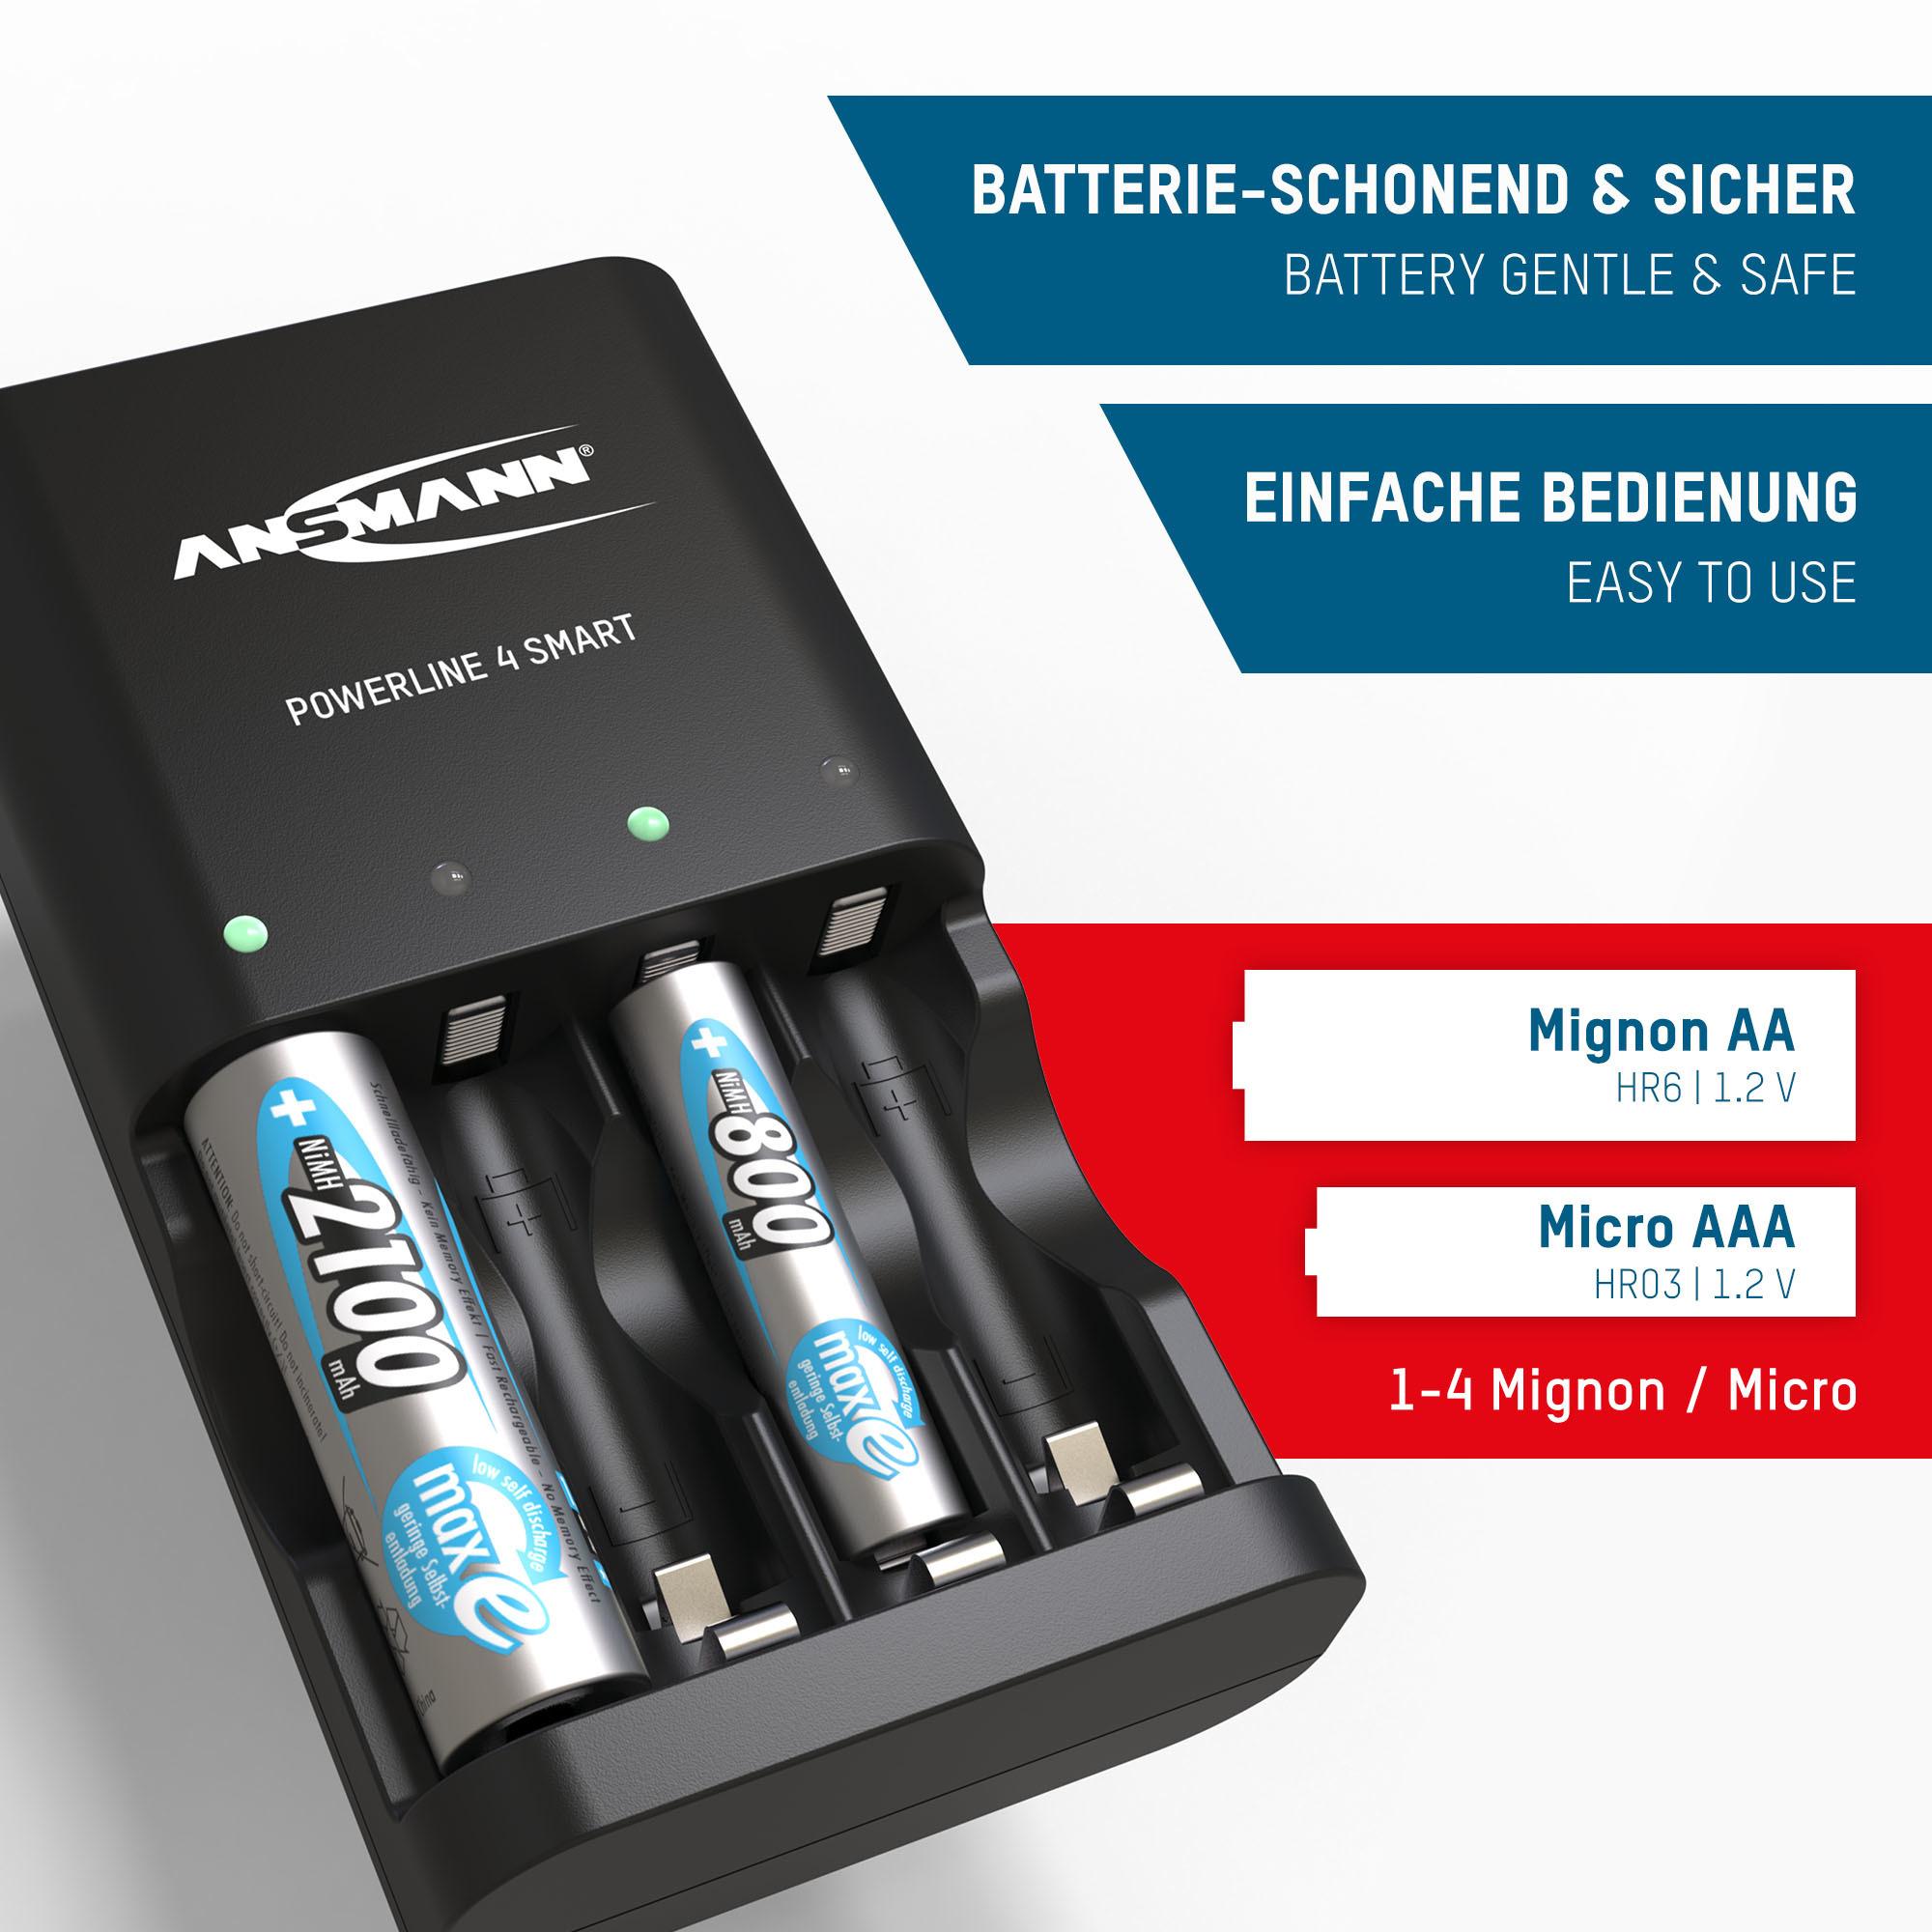 ANSMANN Akku Ladegerät für 1-4x AA/AAA Akkus NiMH Batterieladegerät Repair-Modus